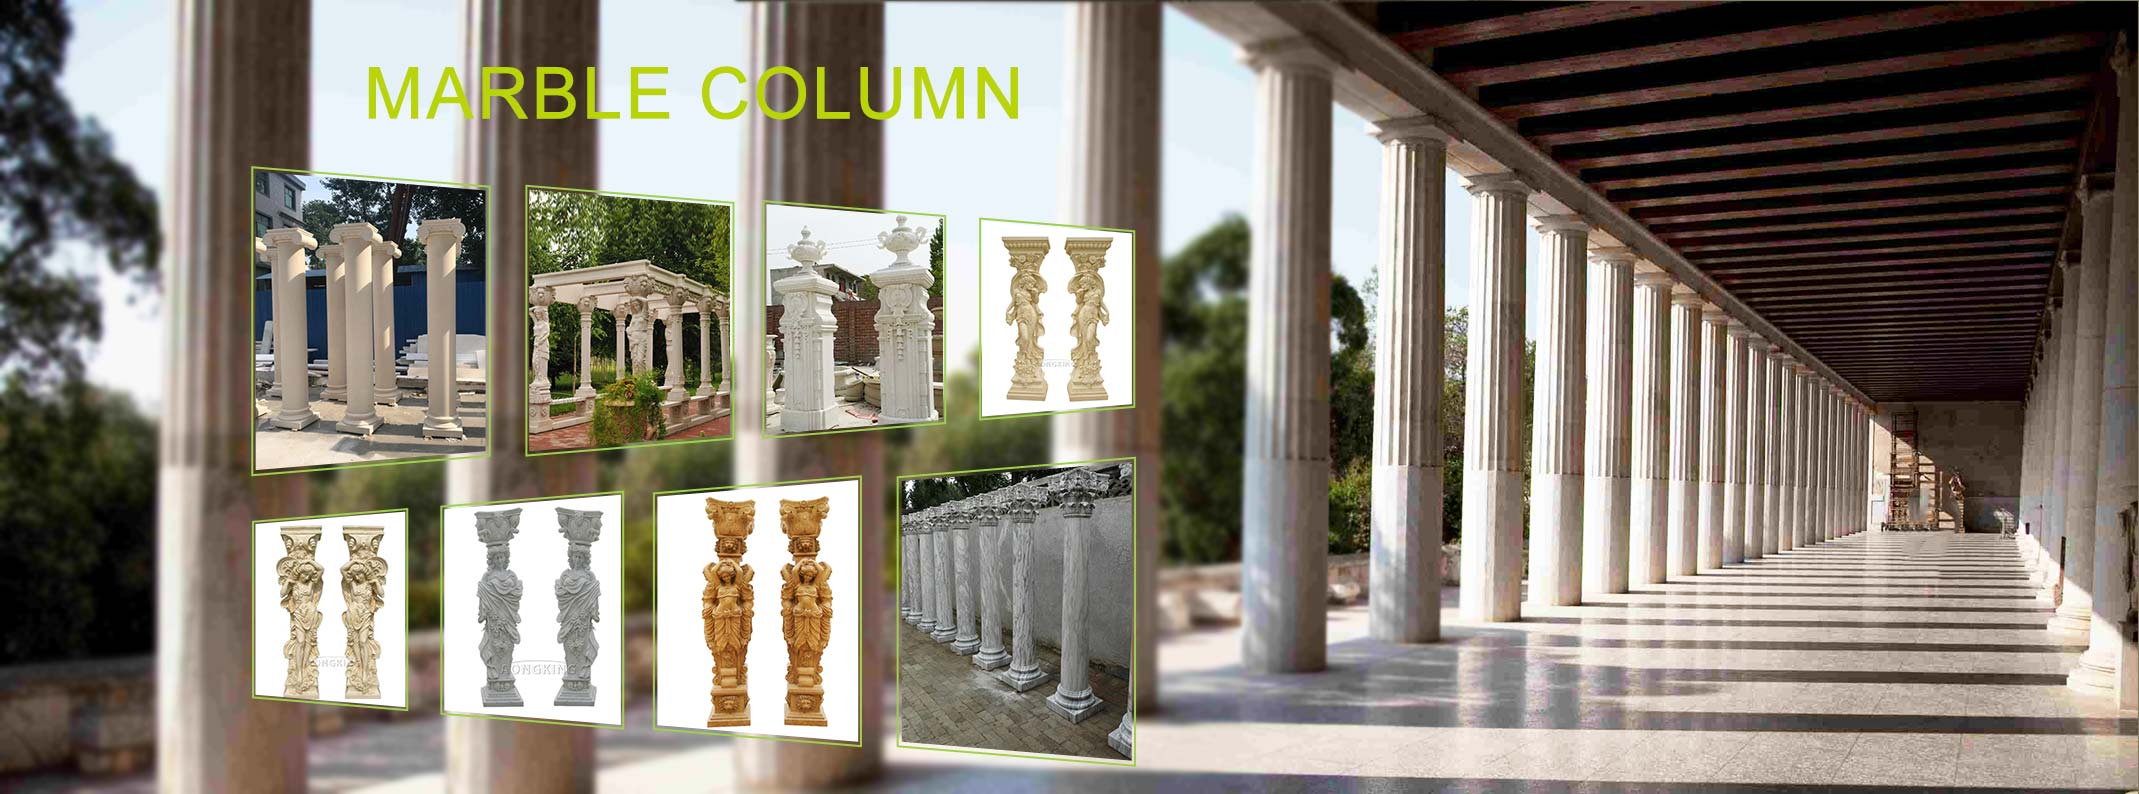 Marble column Statue